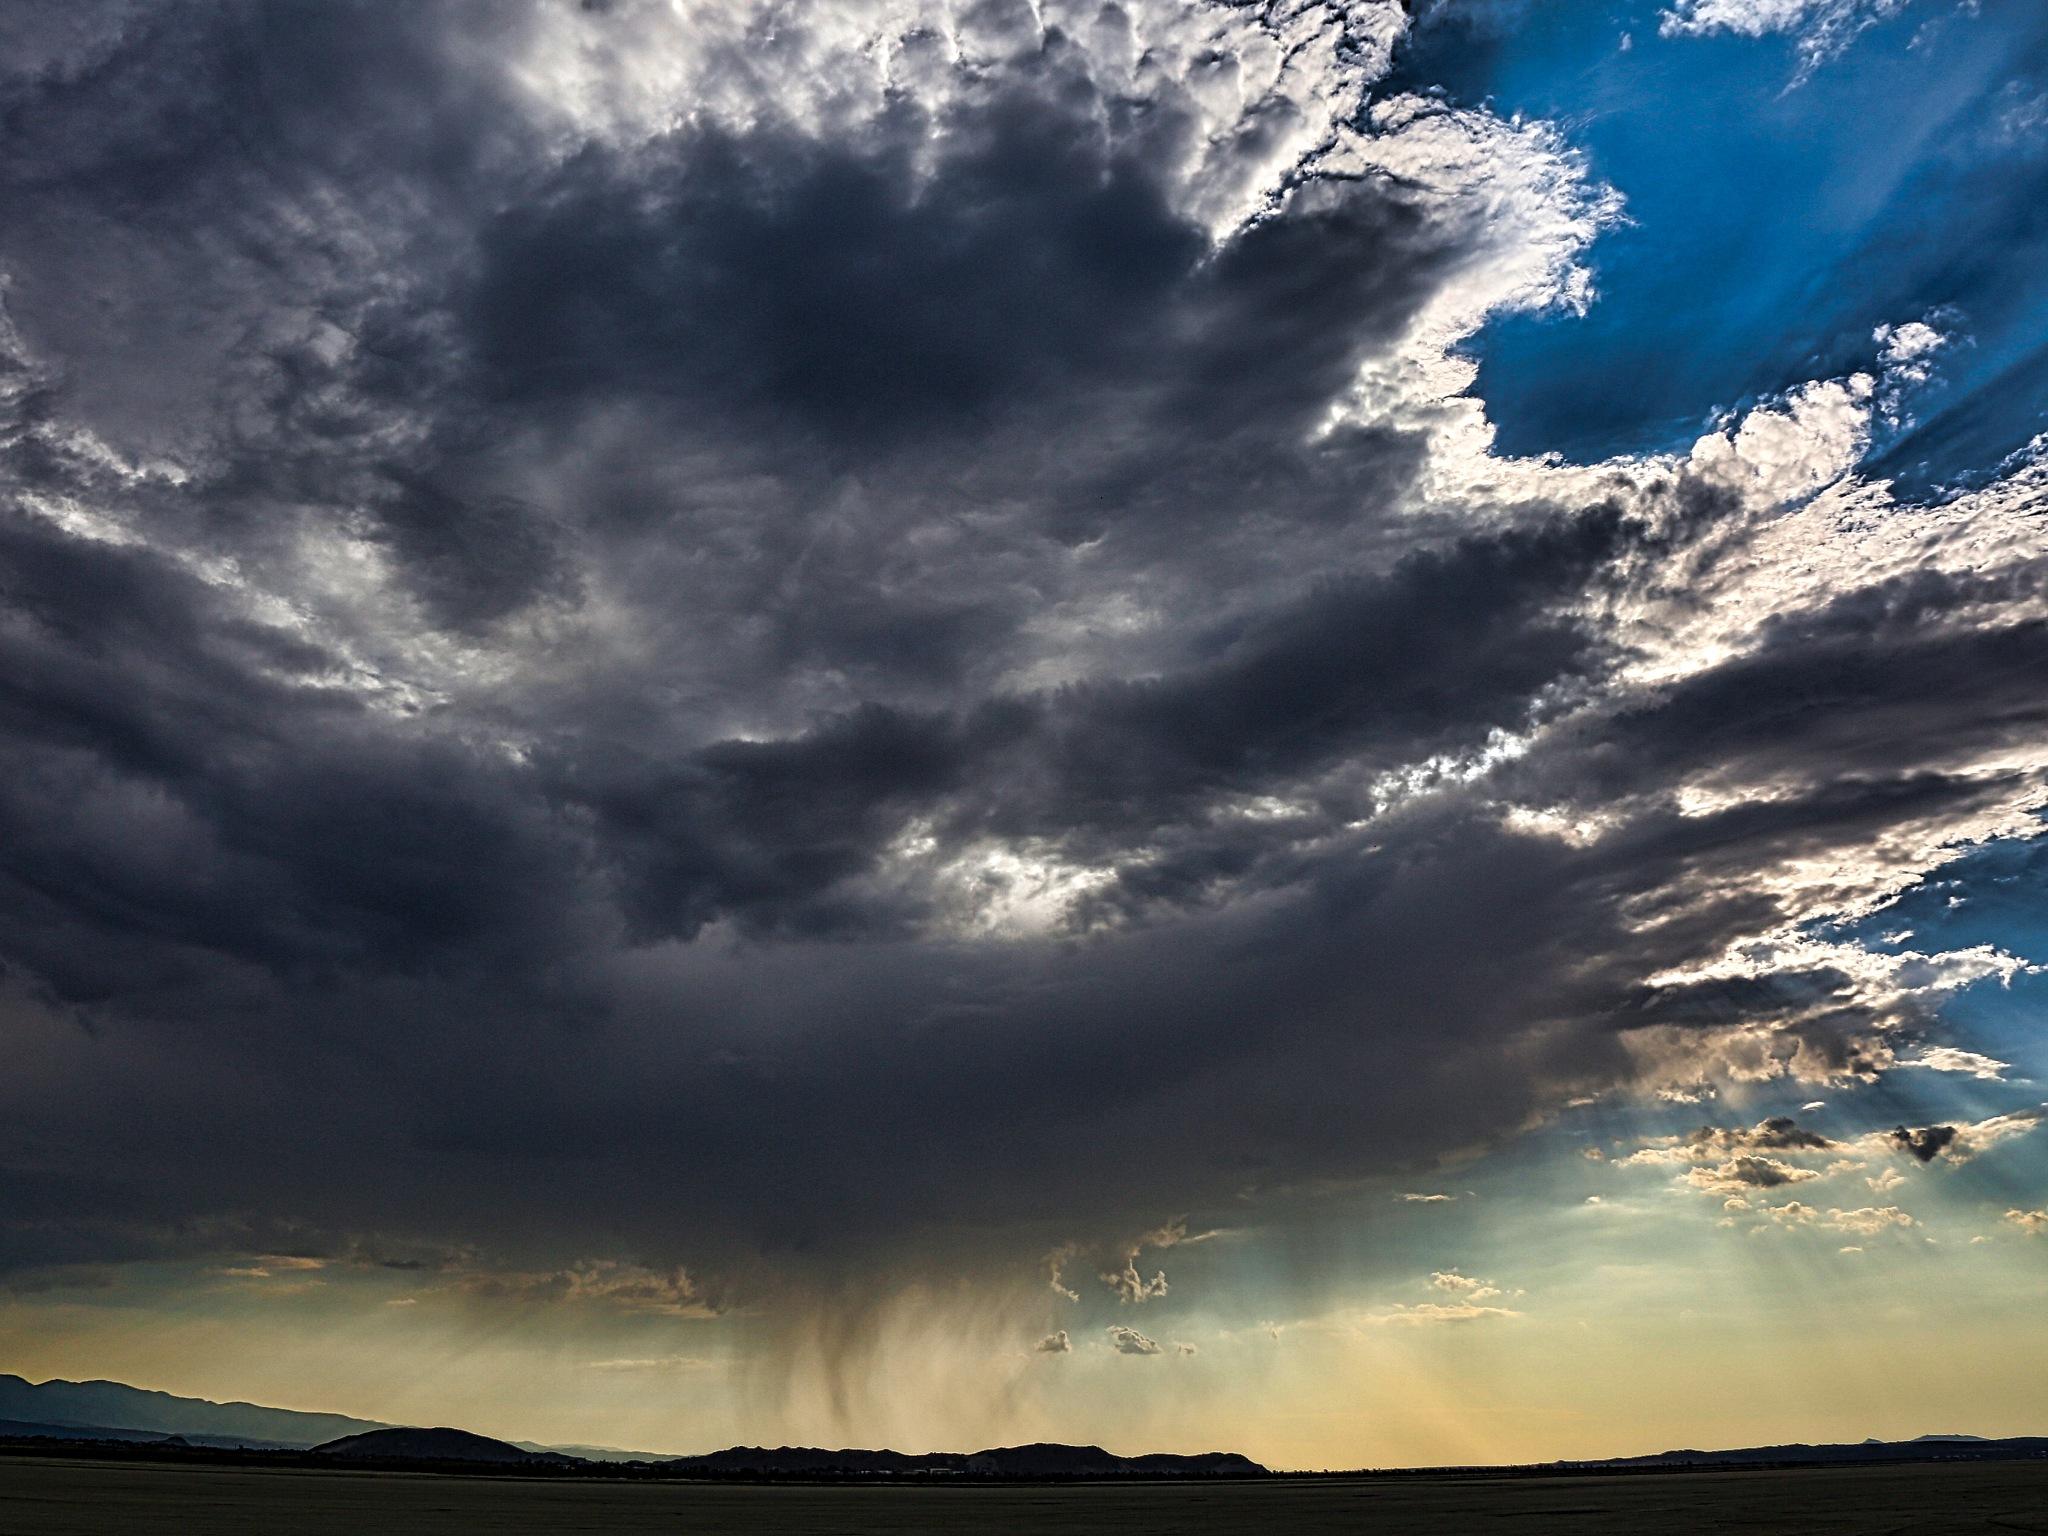 El Mirage Storm by Carson Turner